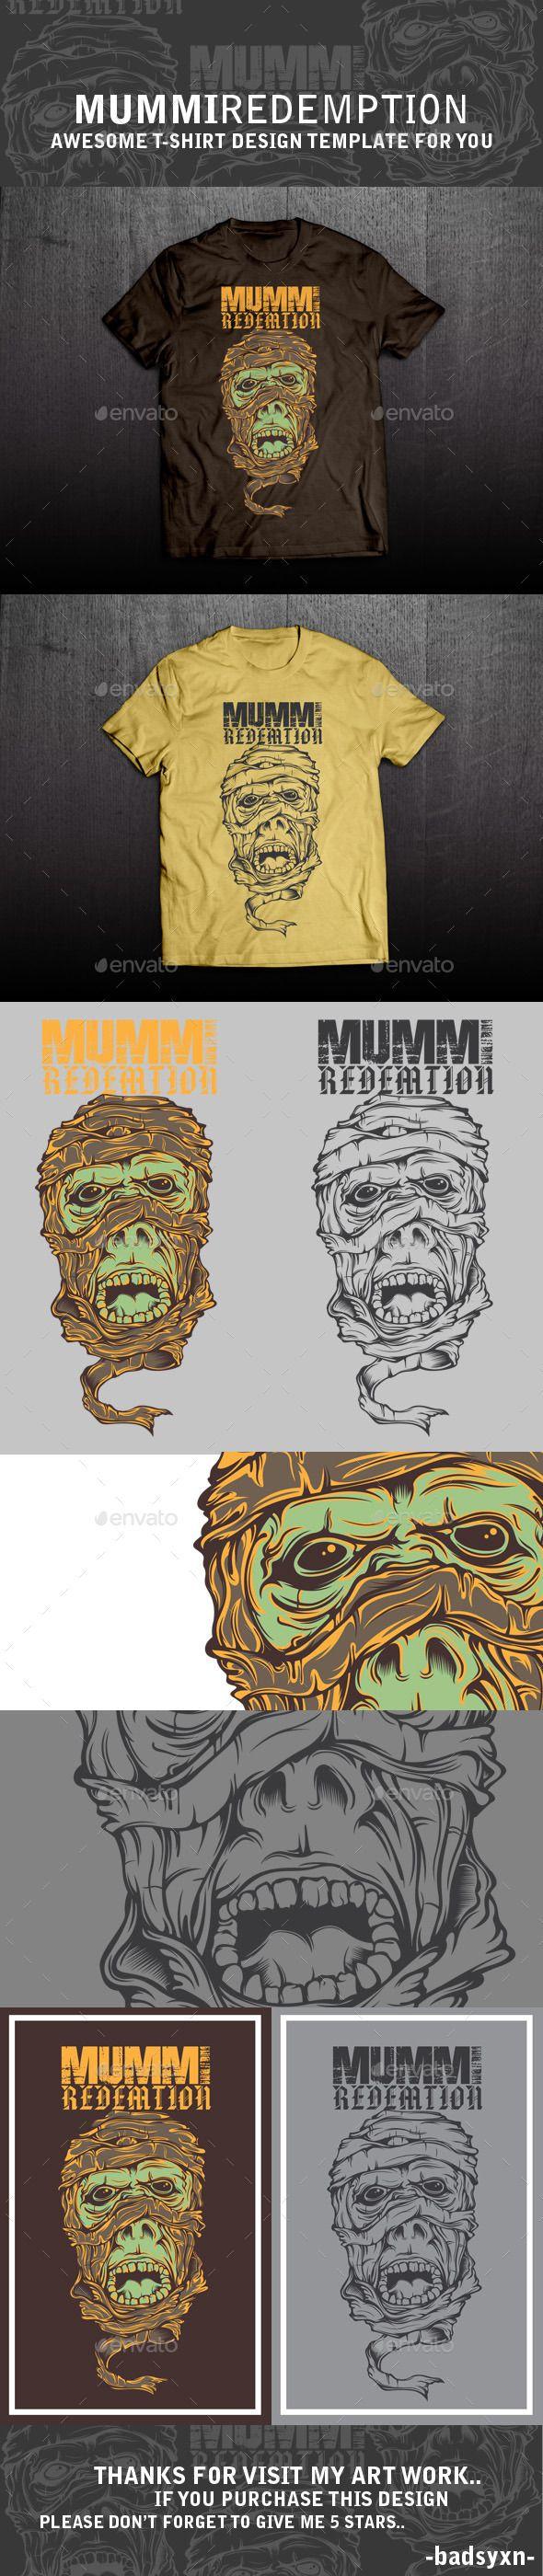 Shirt design ai - Mummi T Shirt Template Funny Designai